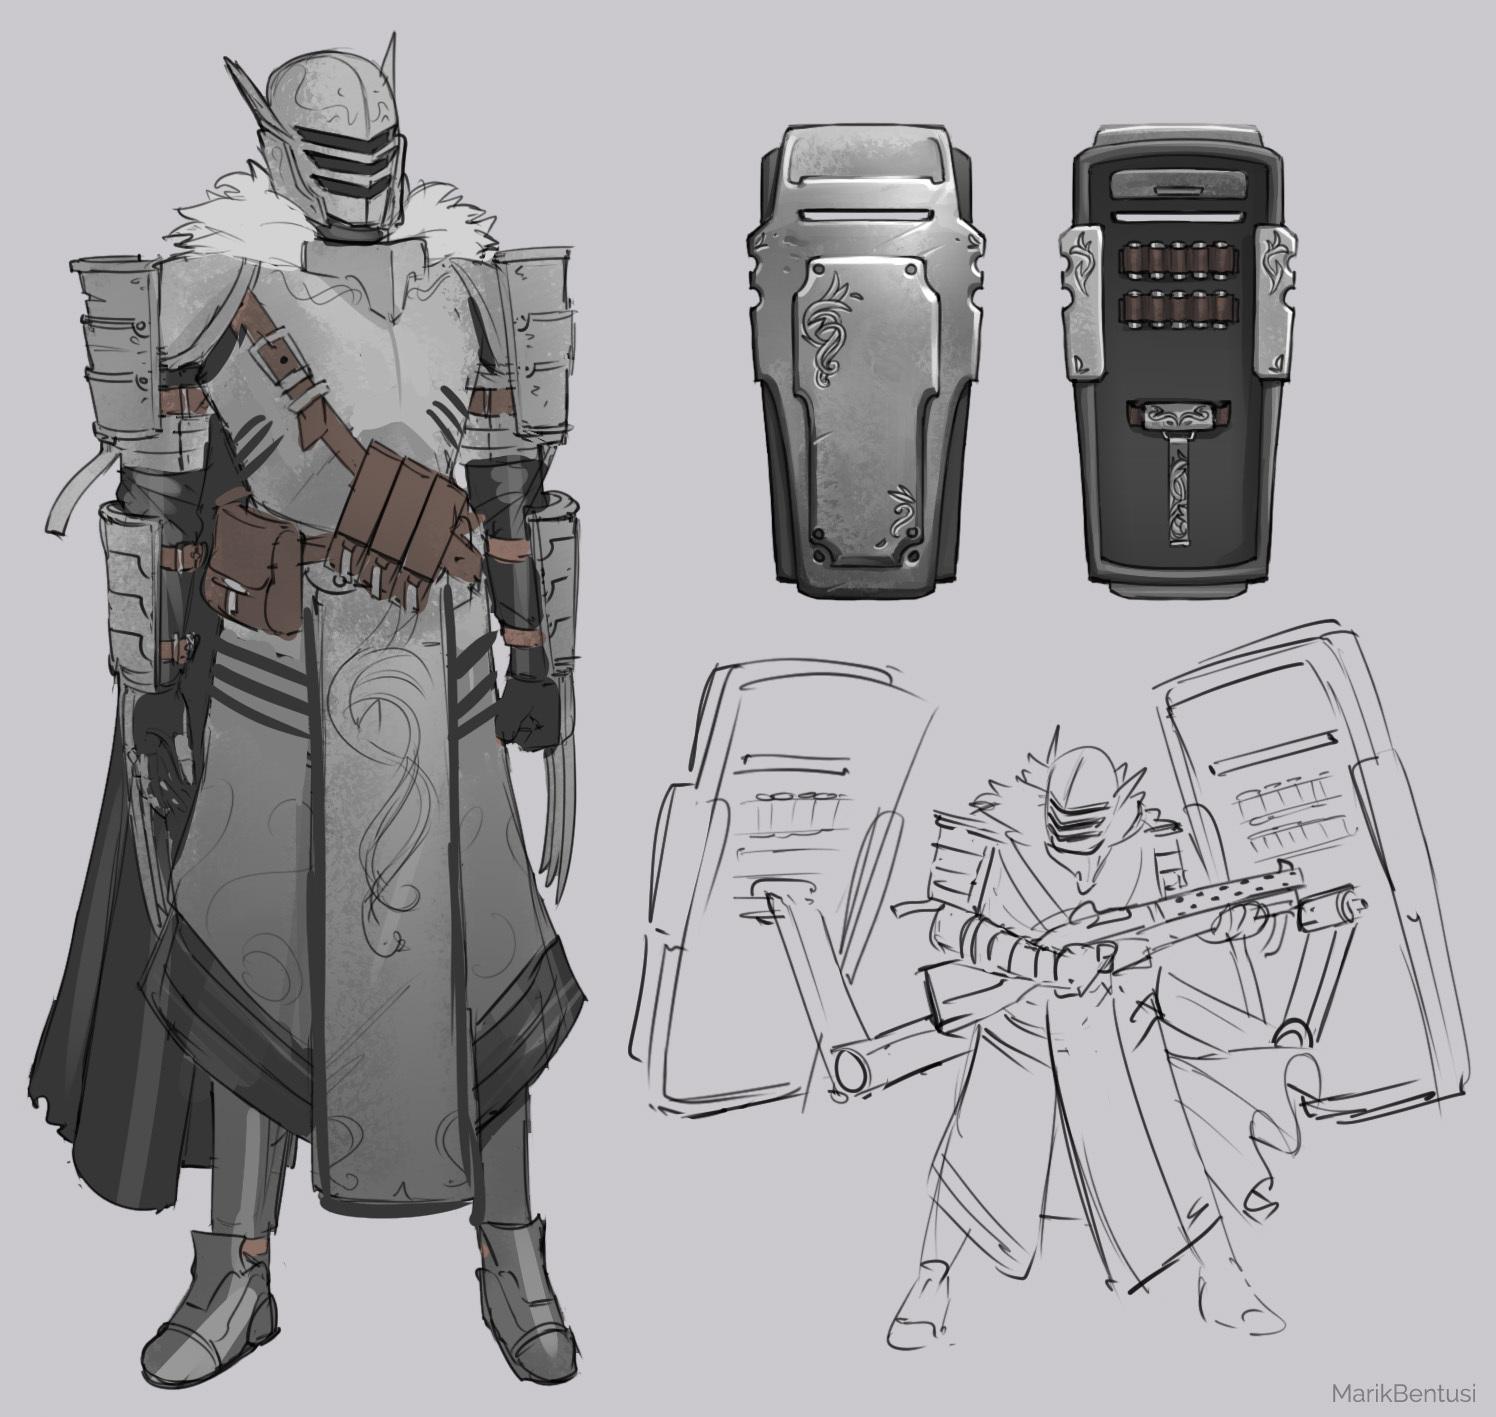 Knight 'n' Guns Sketches